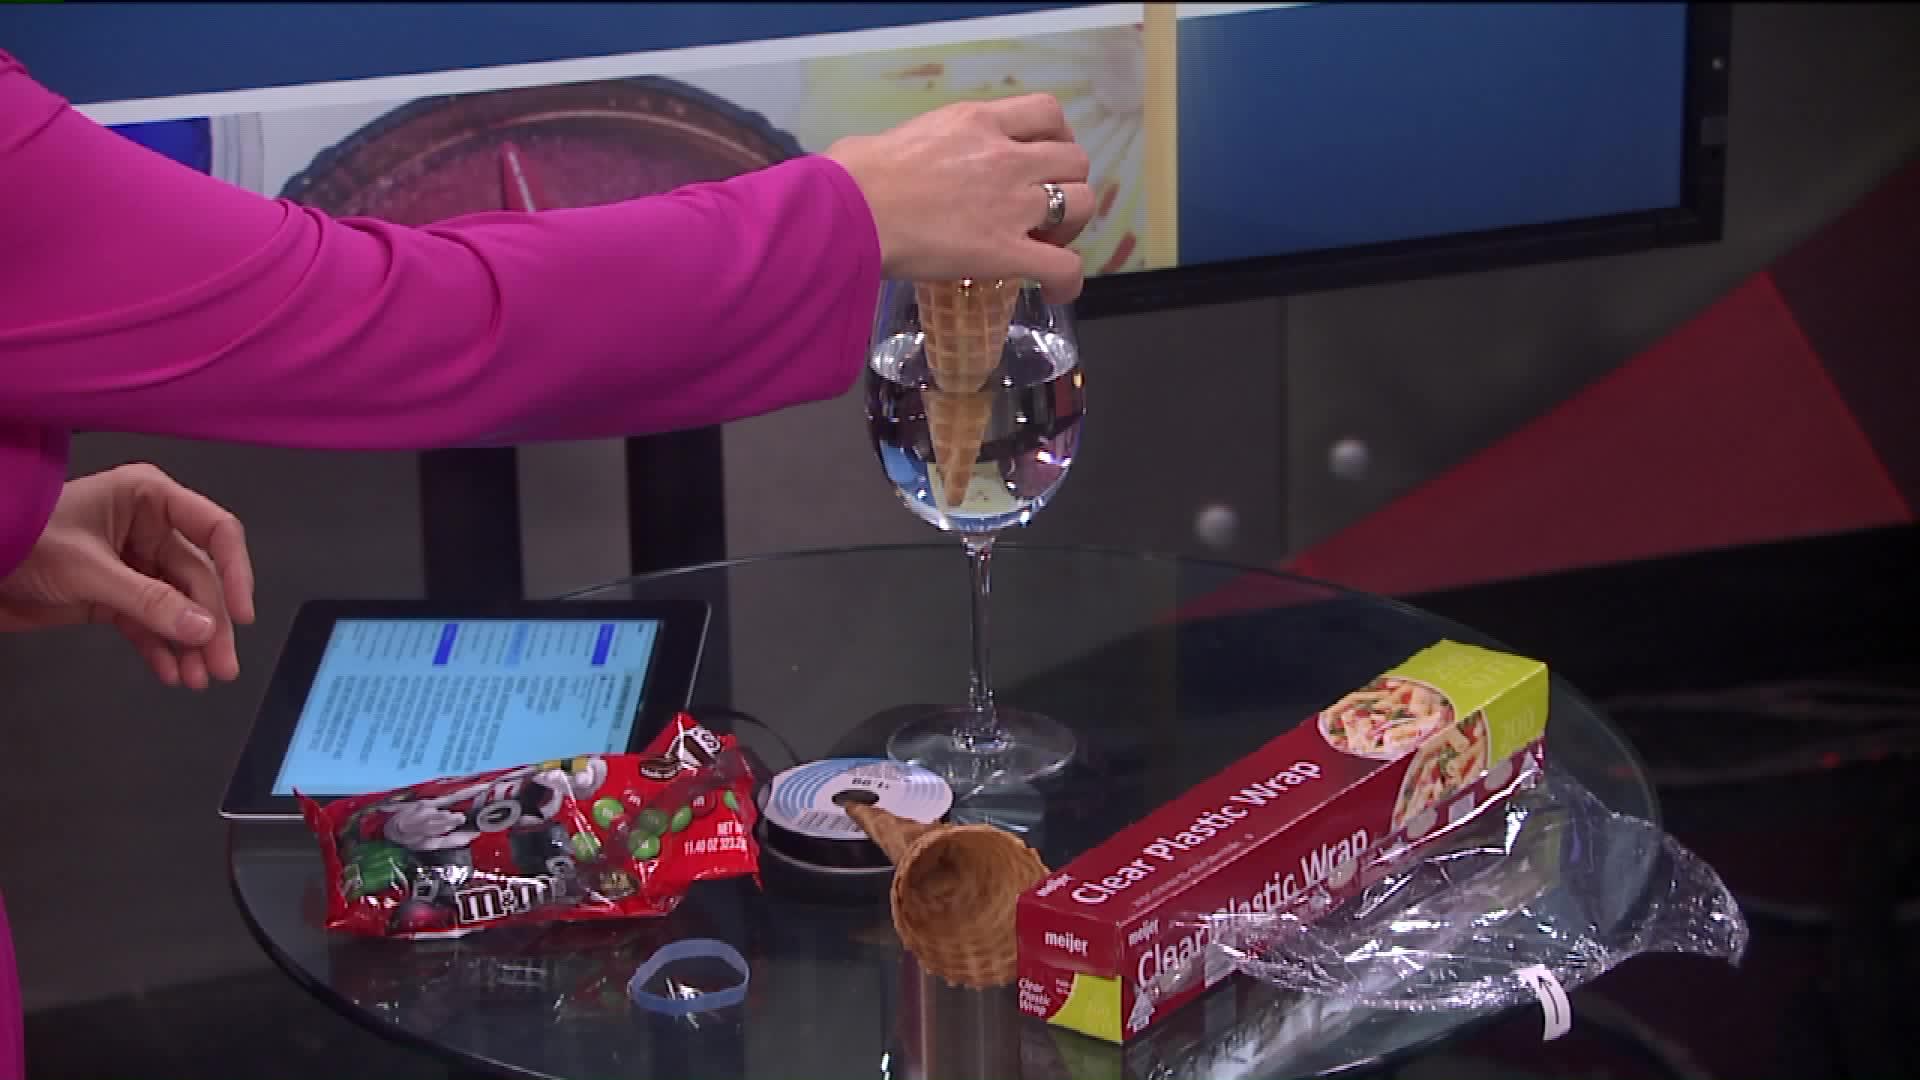 How To Make A Candy Cornucopia